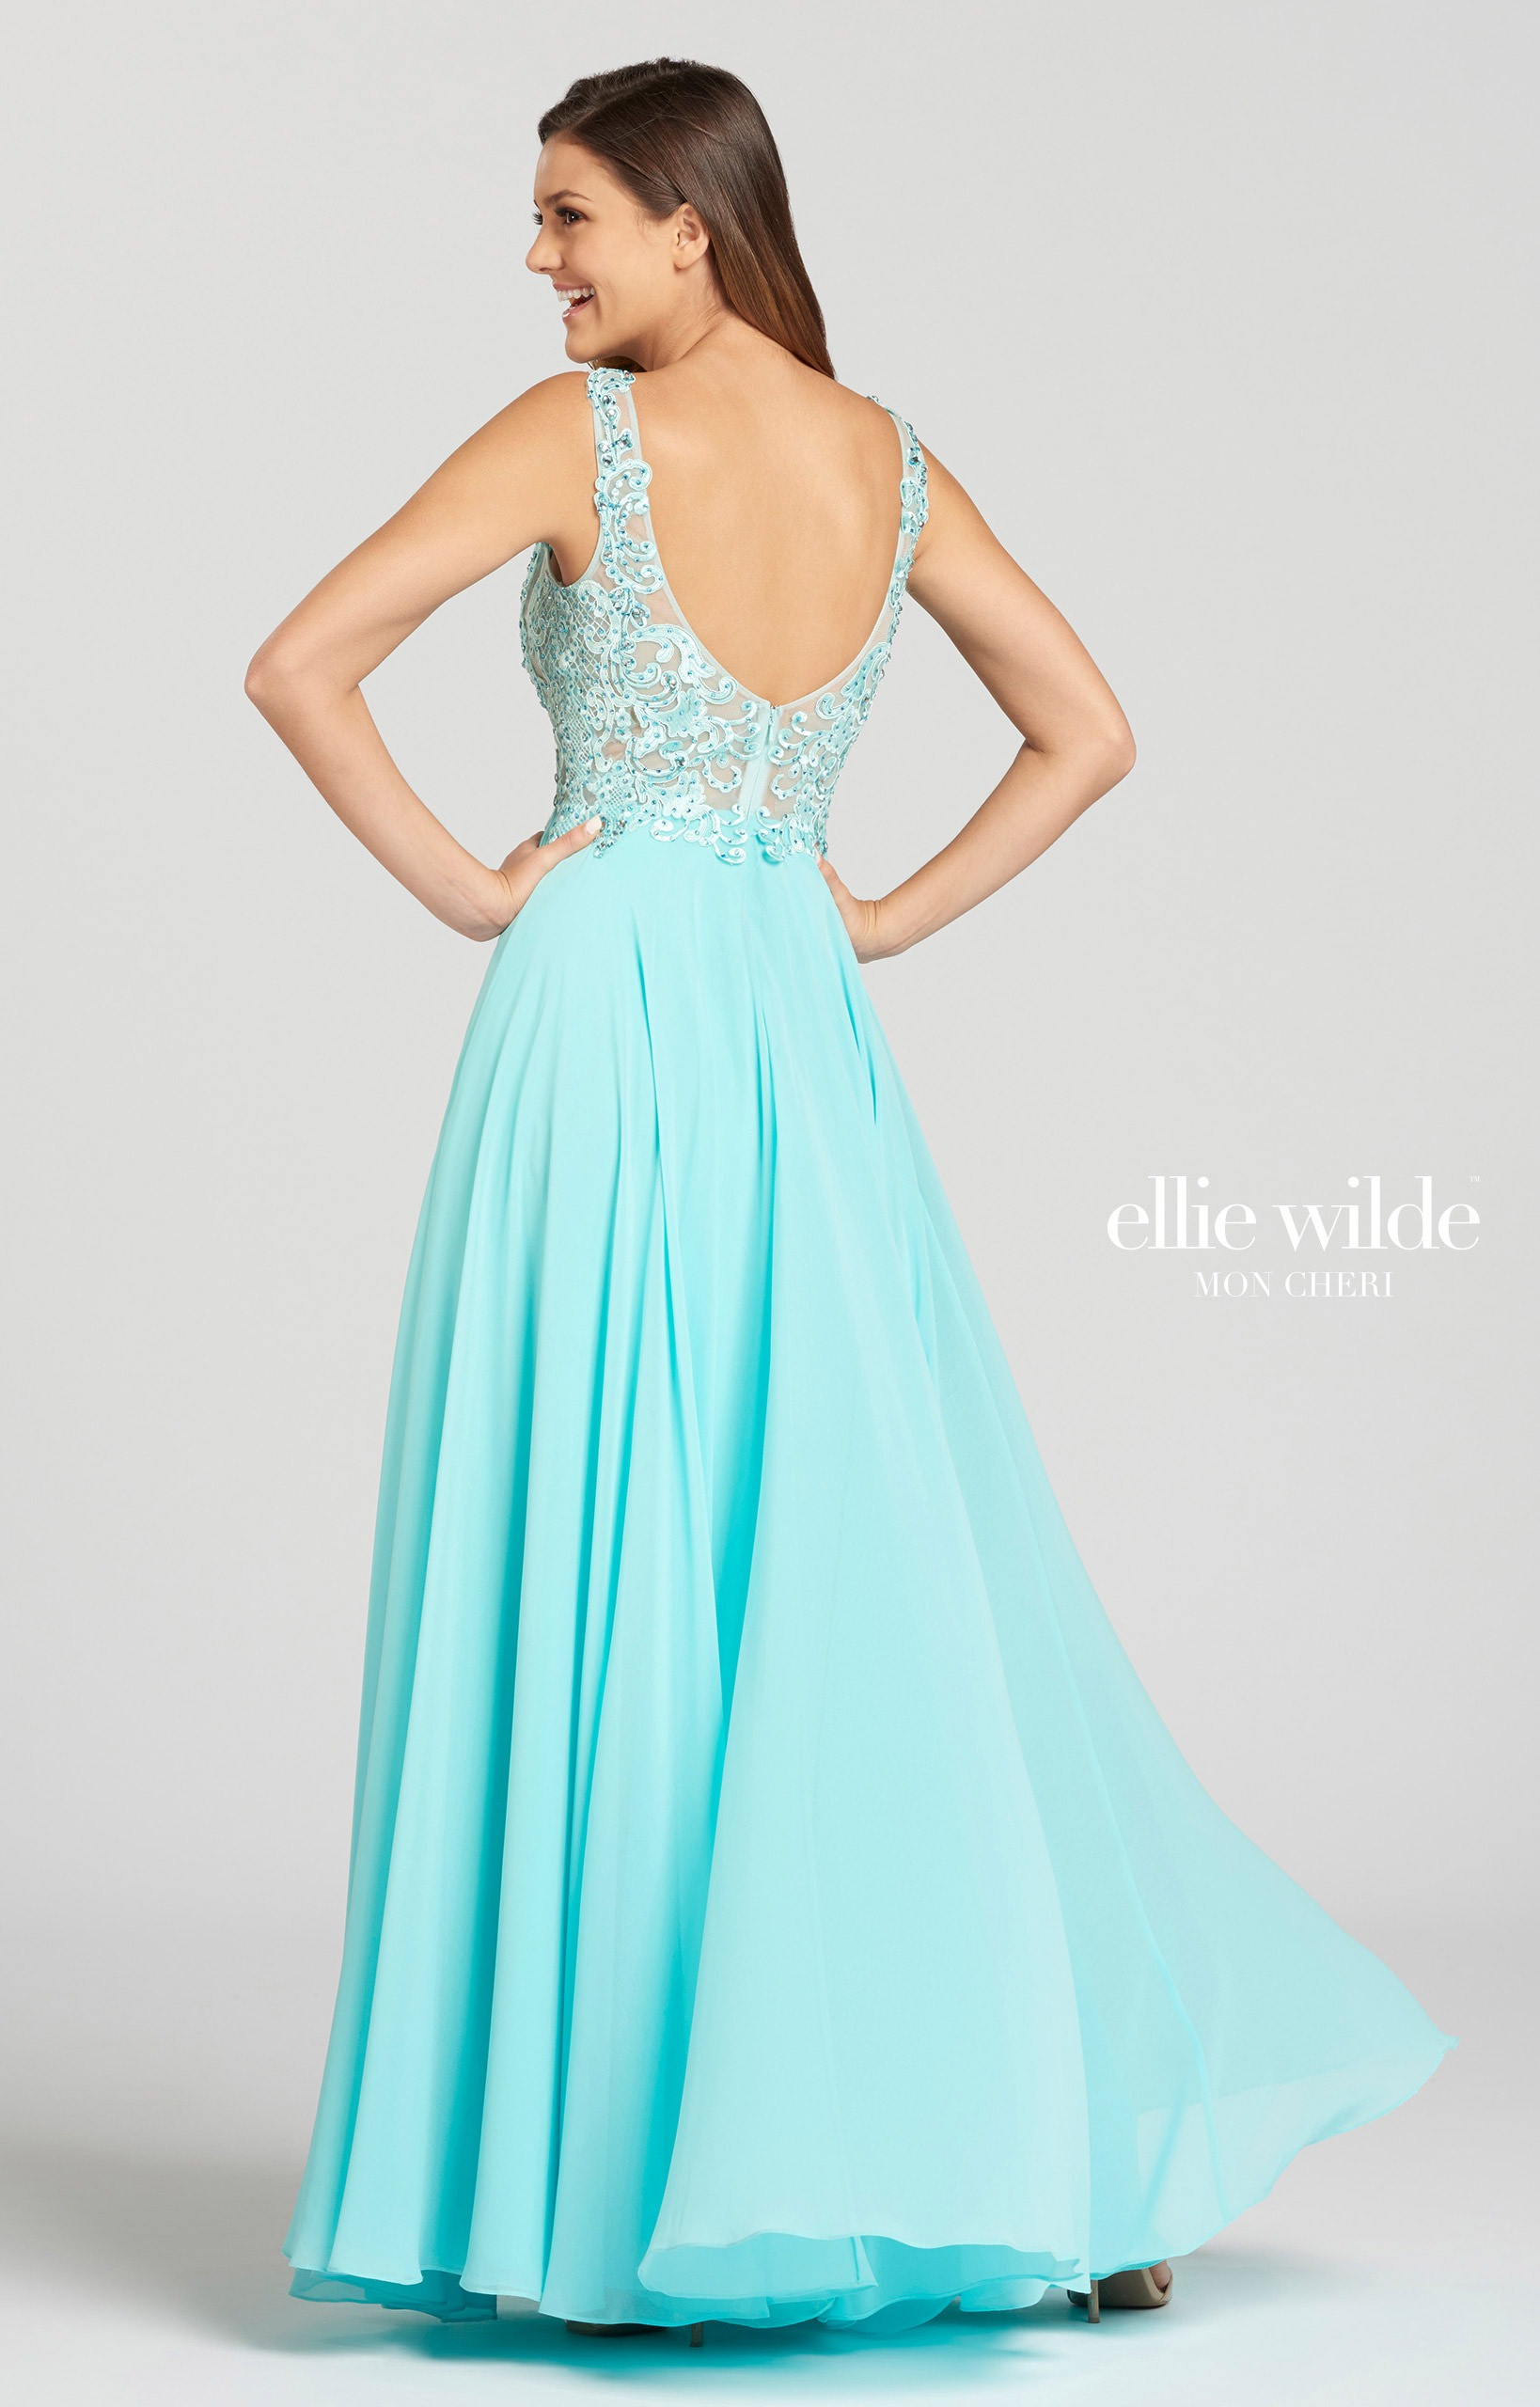 Ellie Wilde EW118150 - Long A-Line Chiffon Prom Dress